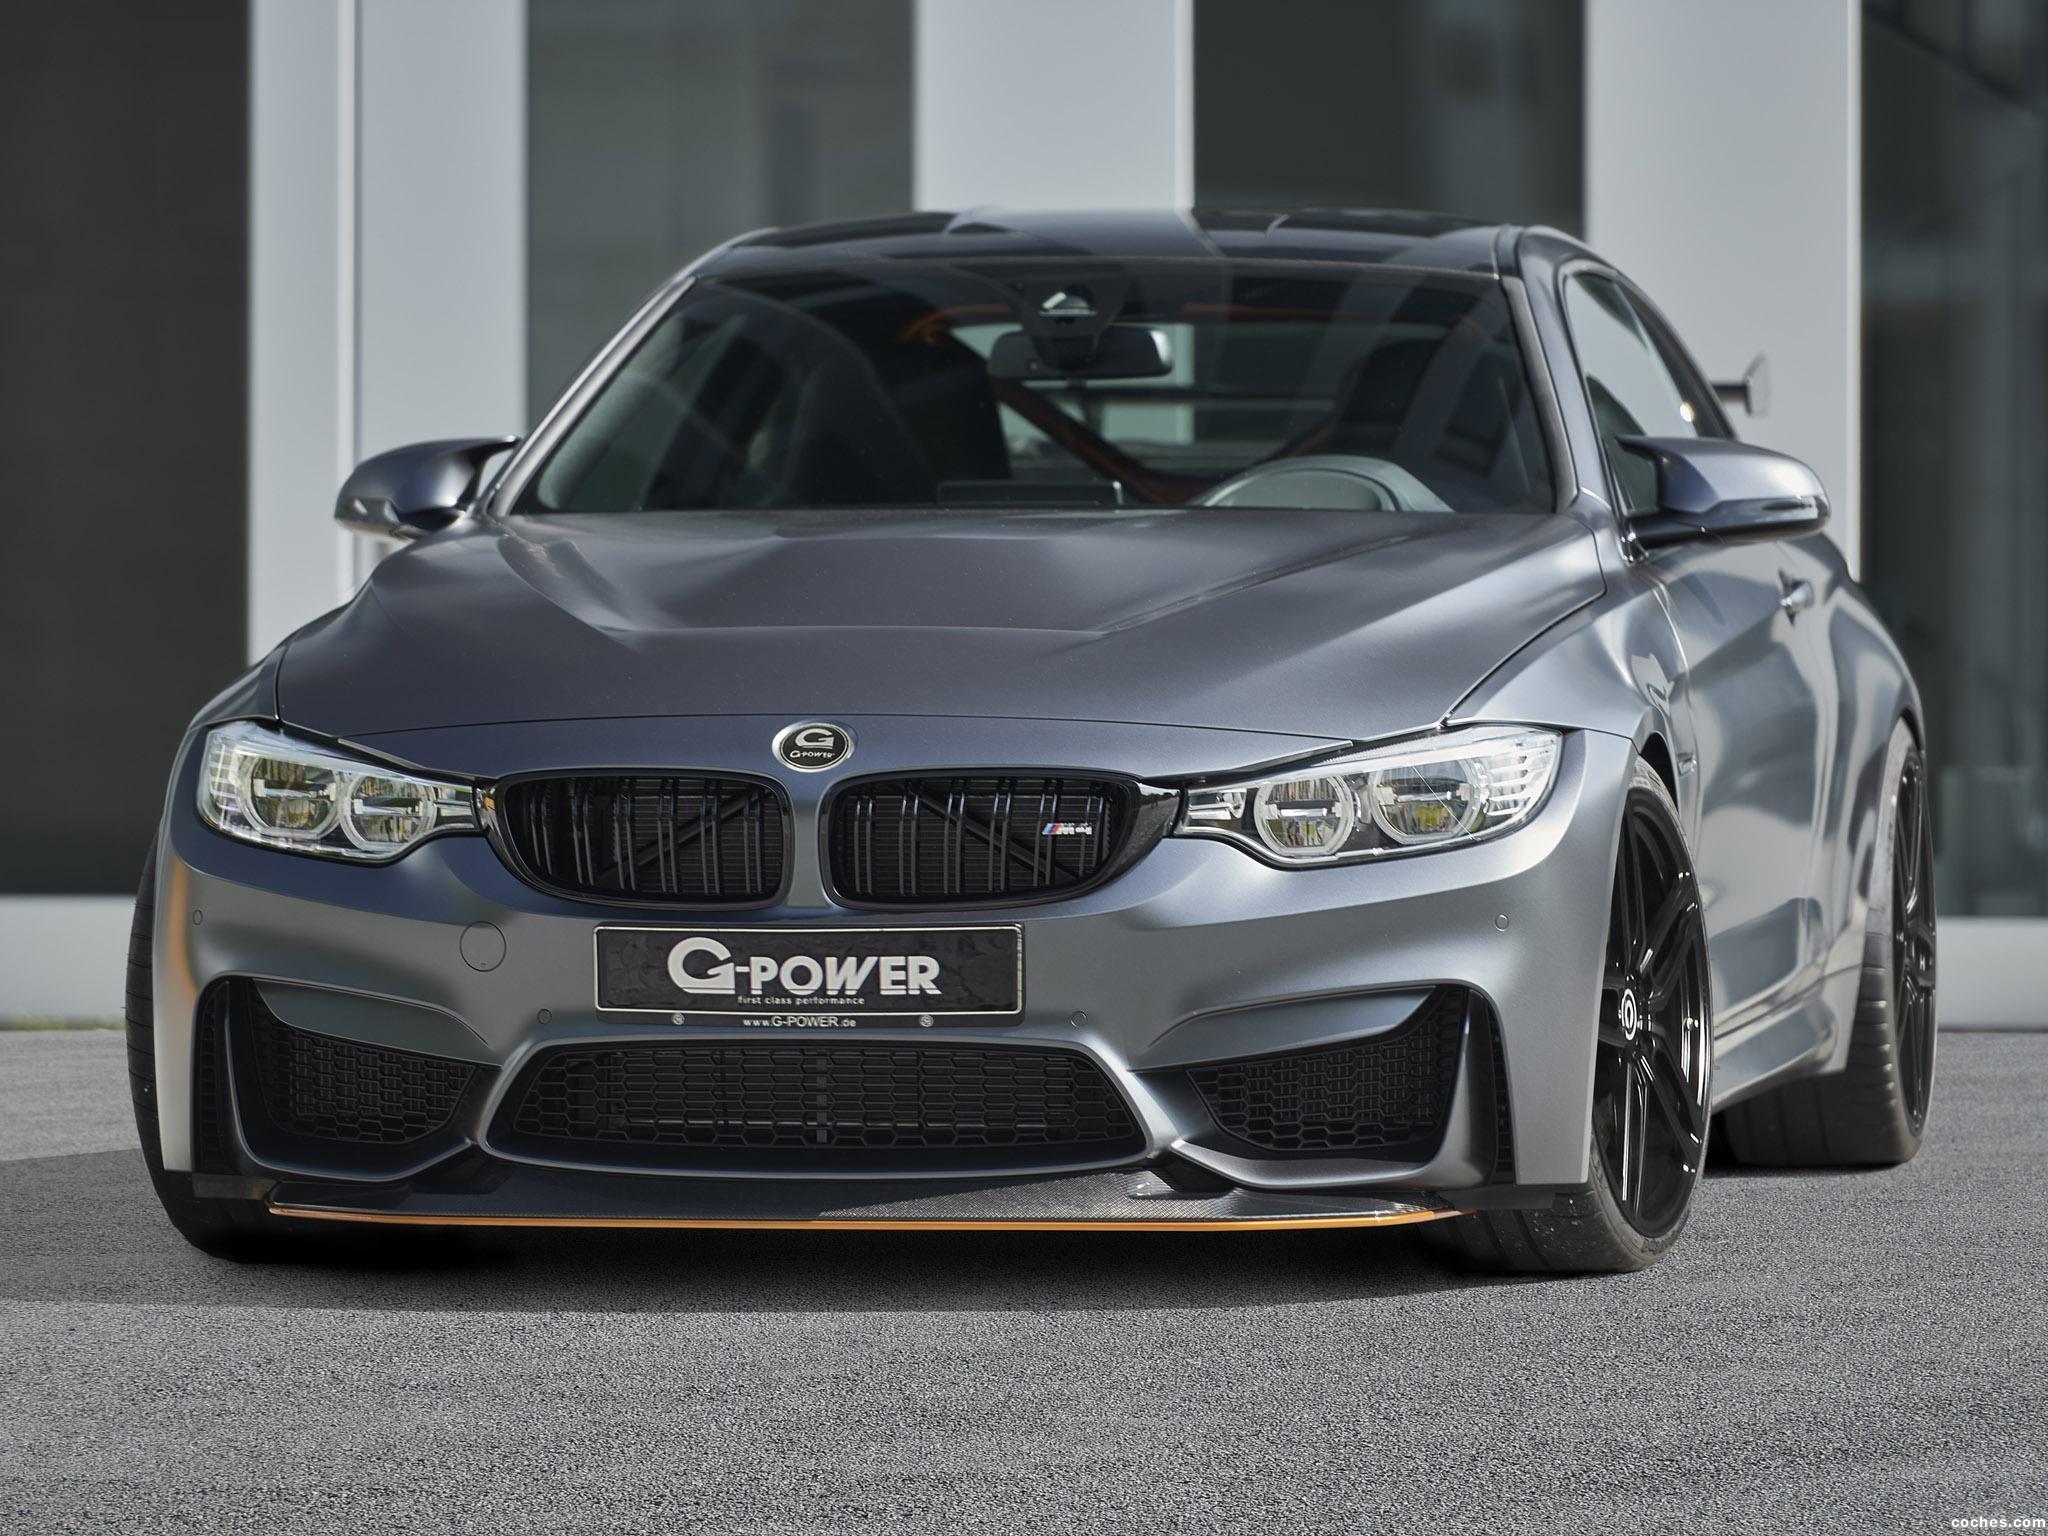 Foto 3 de G-power BMW M4 GTS F82 2016